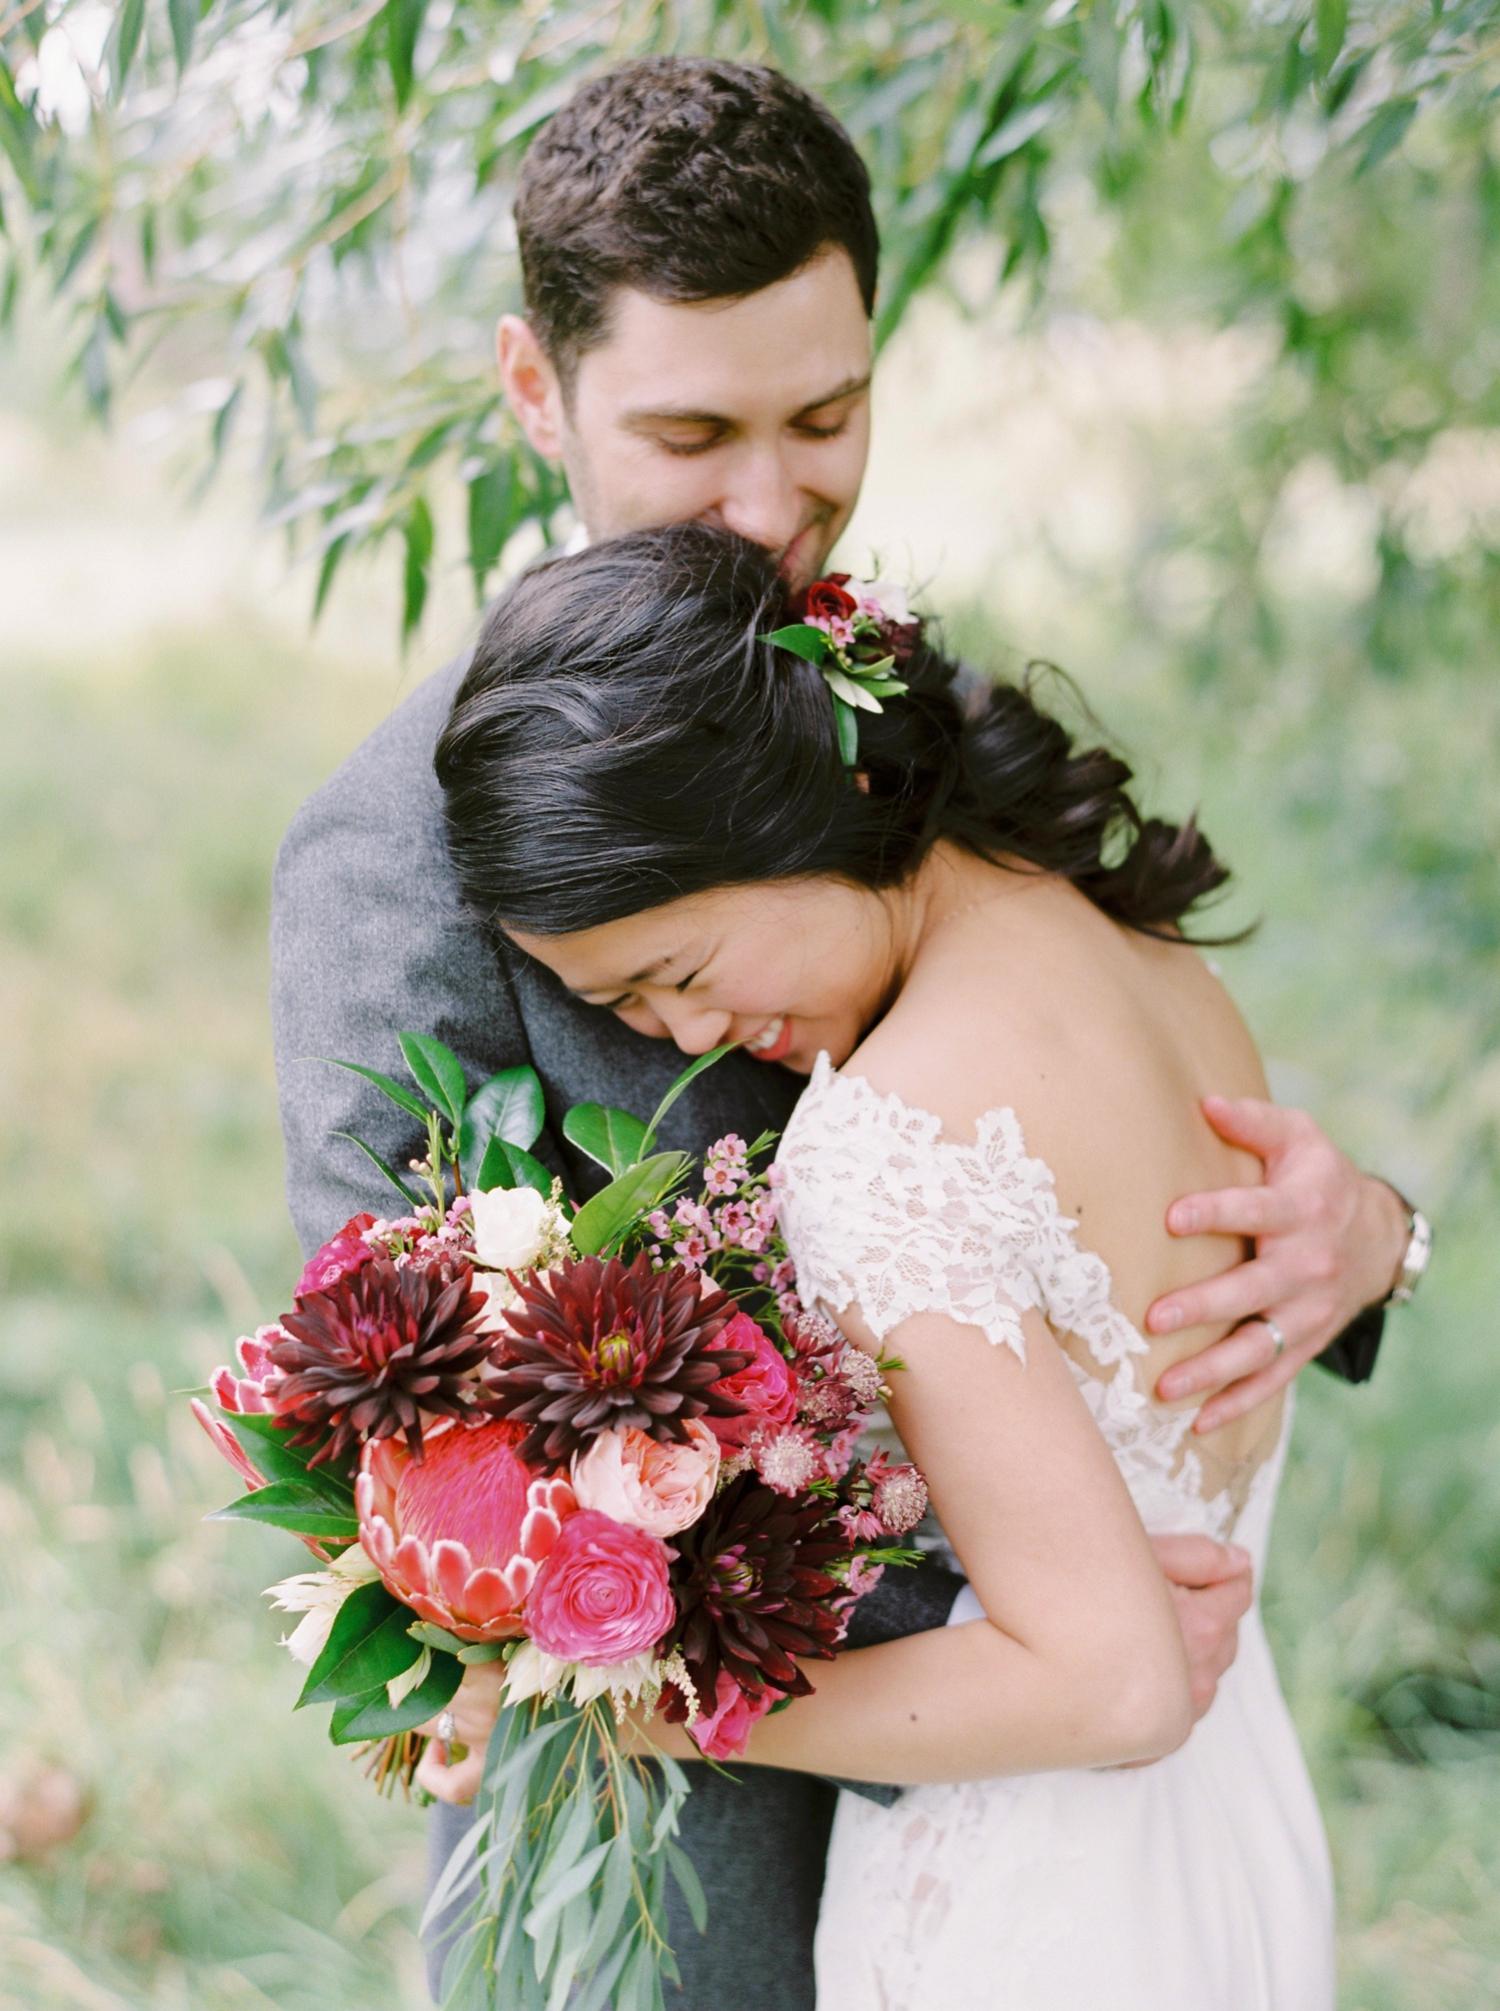 Calgary wedding photographer | fine art film photography | Calgary Wedding Photographers | Justine Milton Photography | workshop wedding | bride and groom portraits